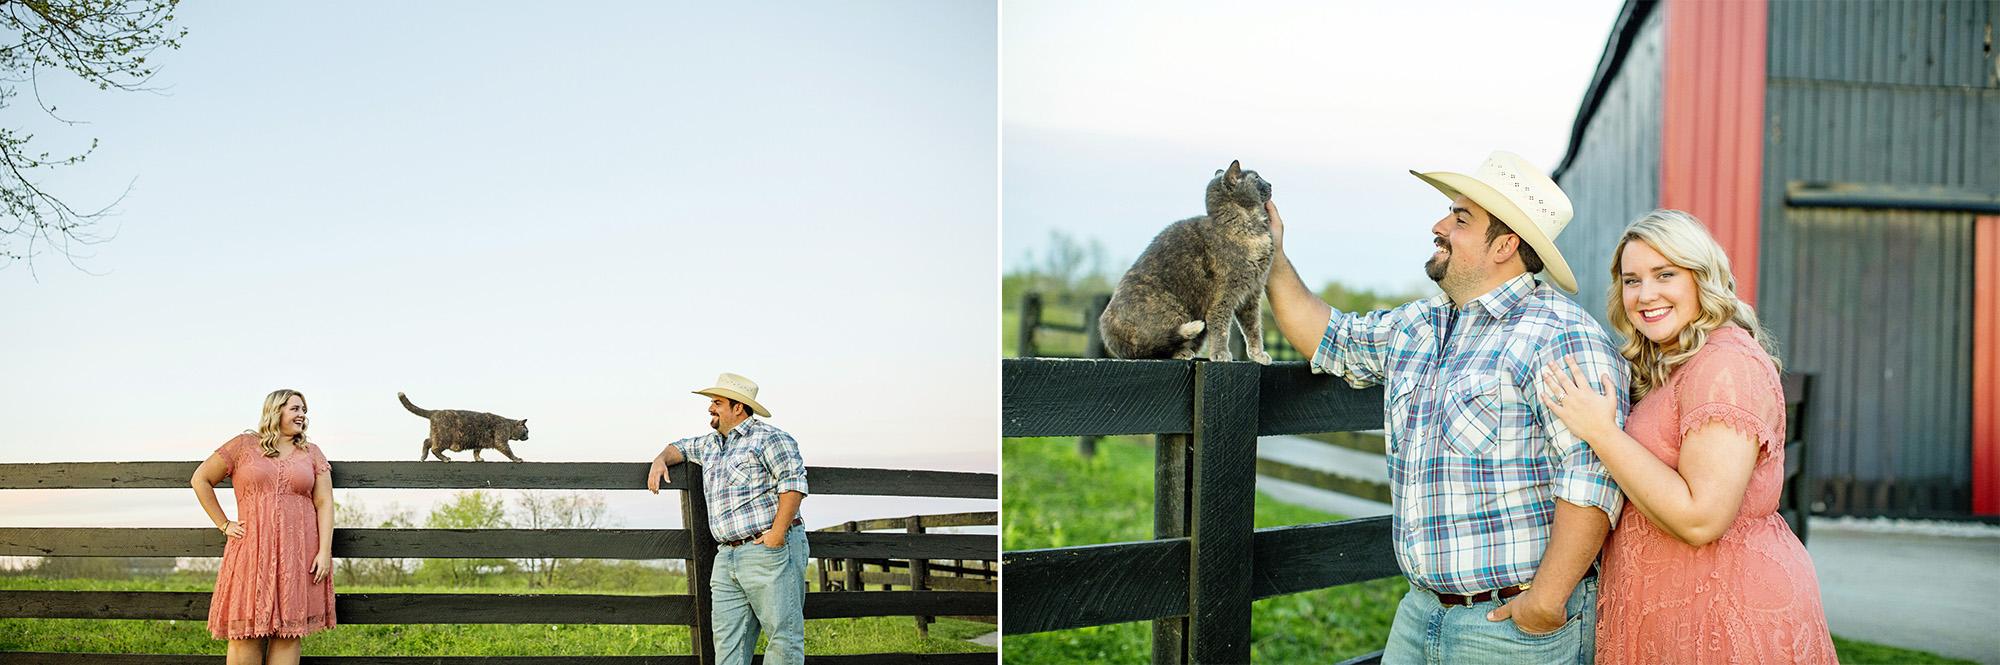 Seriously_Sabrina_Photography_Lexington_Kentucky_Sunset_Farm_Engagement_Cody_Sara_36.jpg